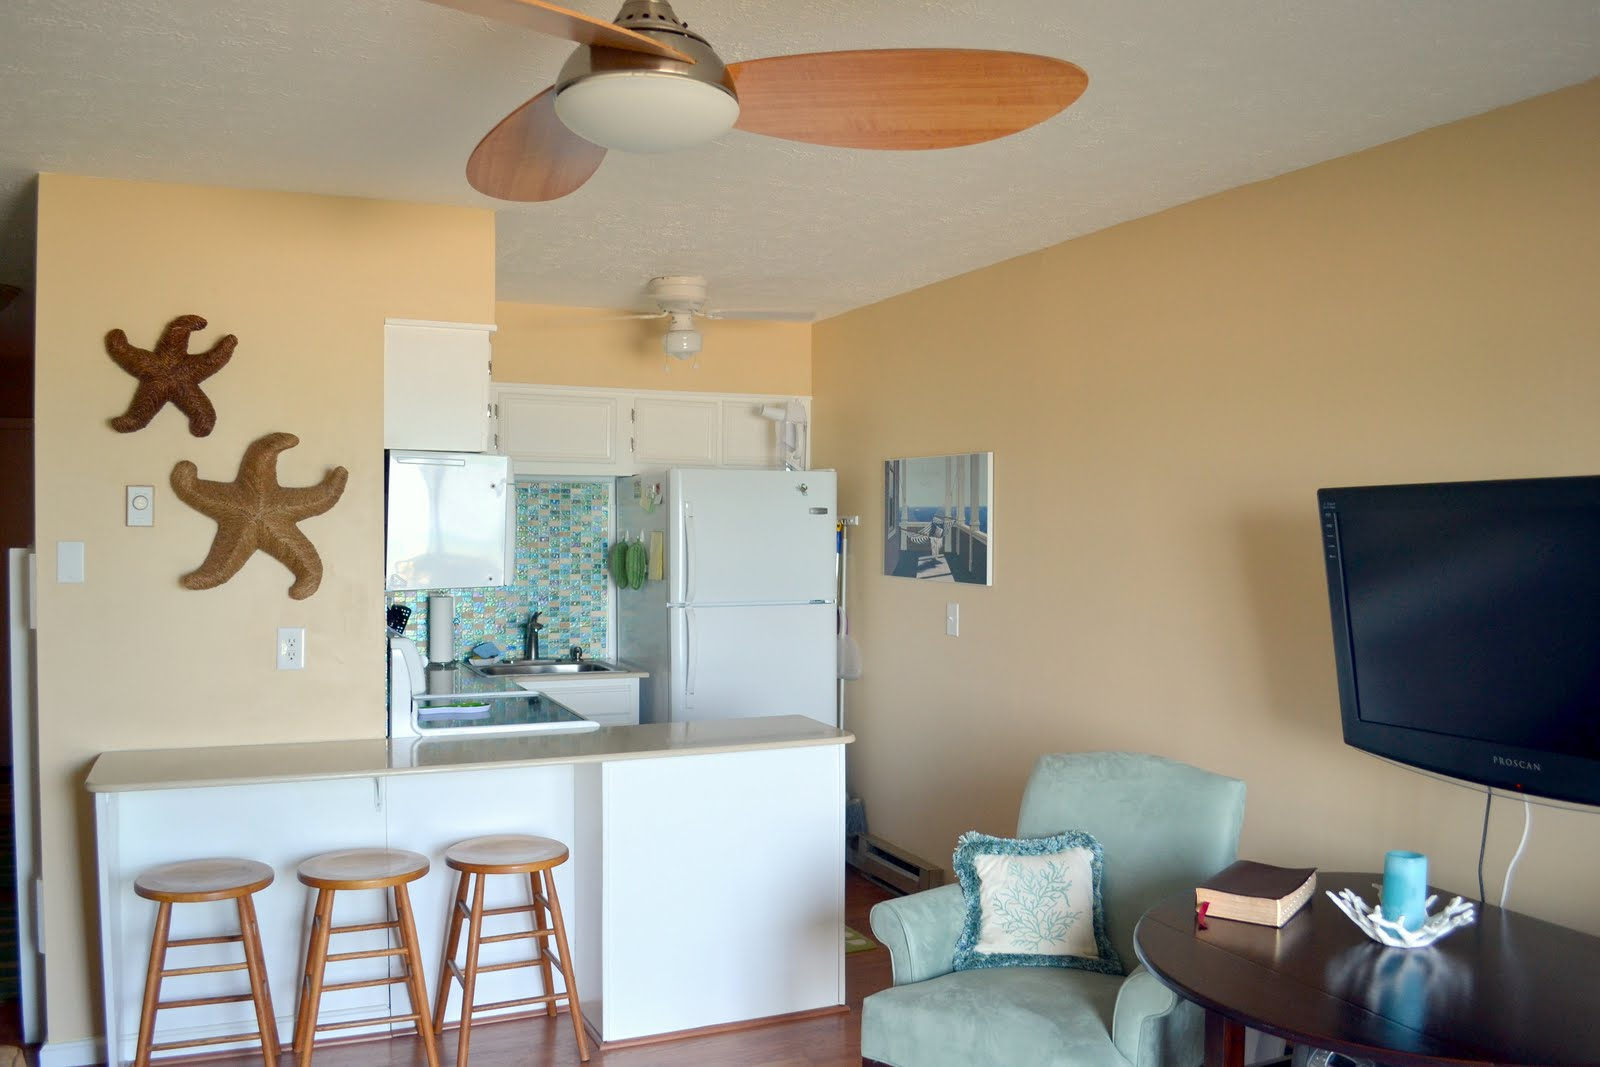 Beach Condo Decorating Ideas With Photos  Joy Studio Design Gallery  Best Design